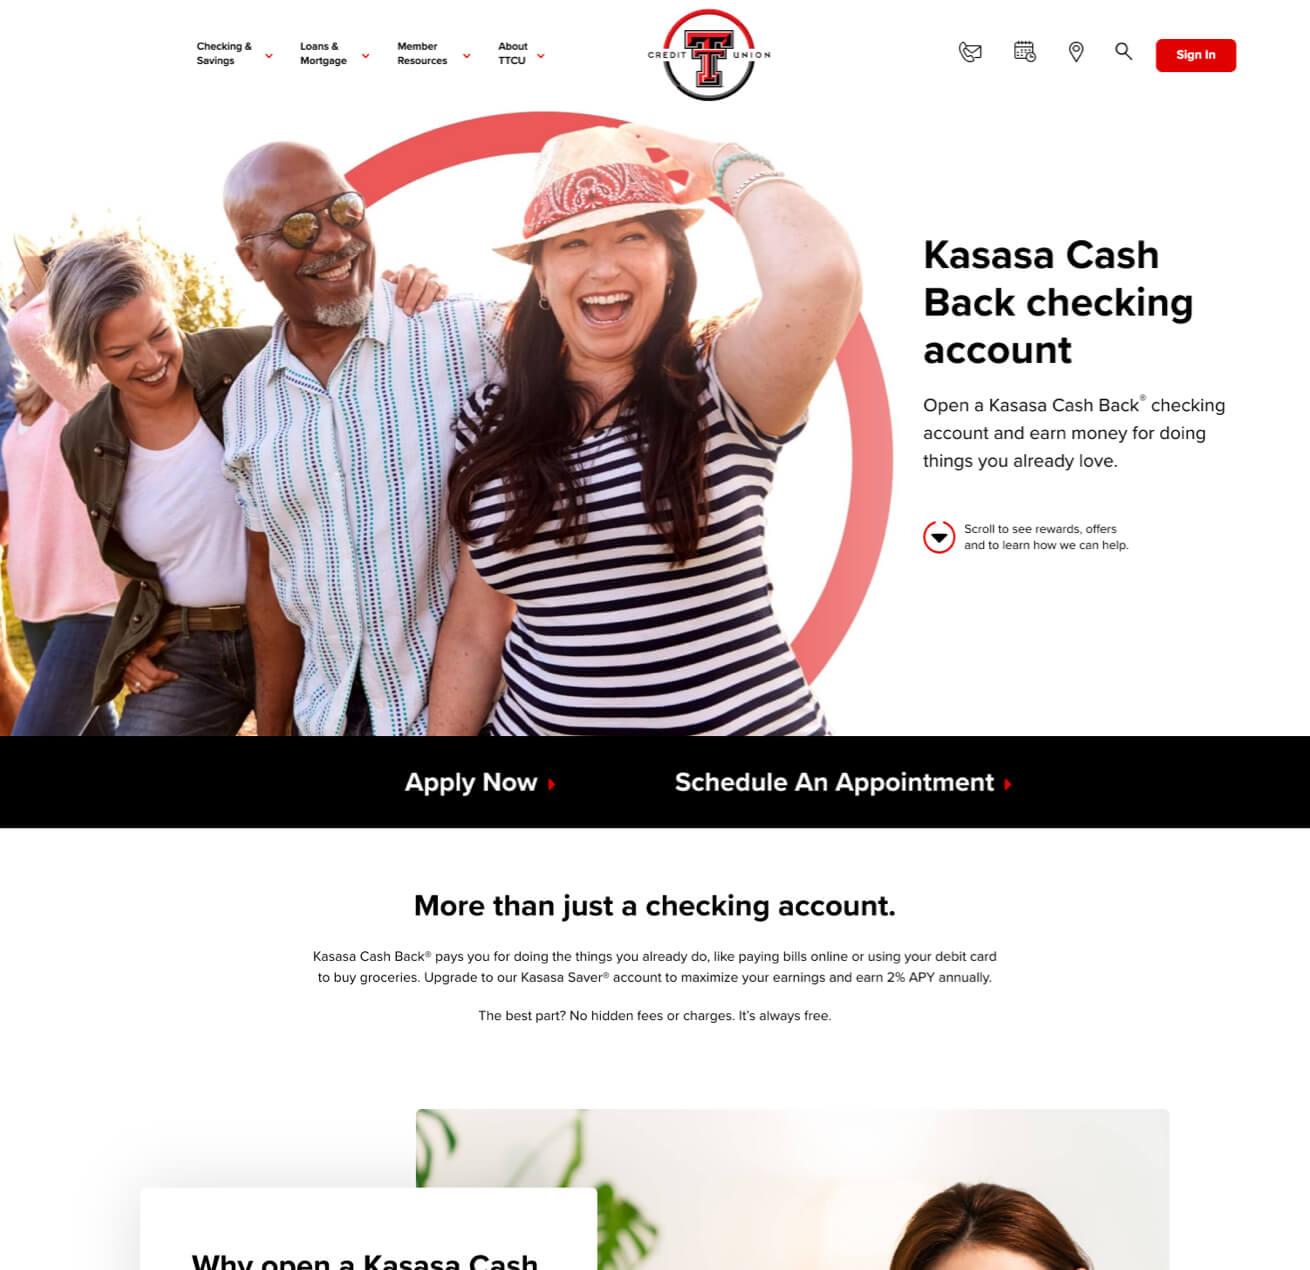 Customized Photos for Texas Tech Credit Union Website